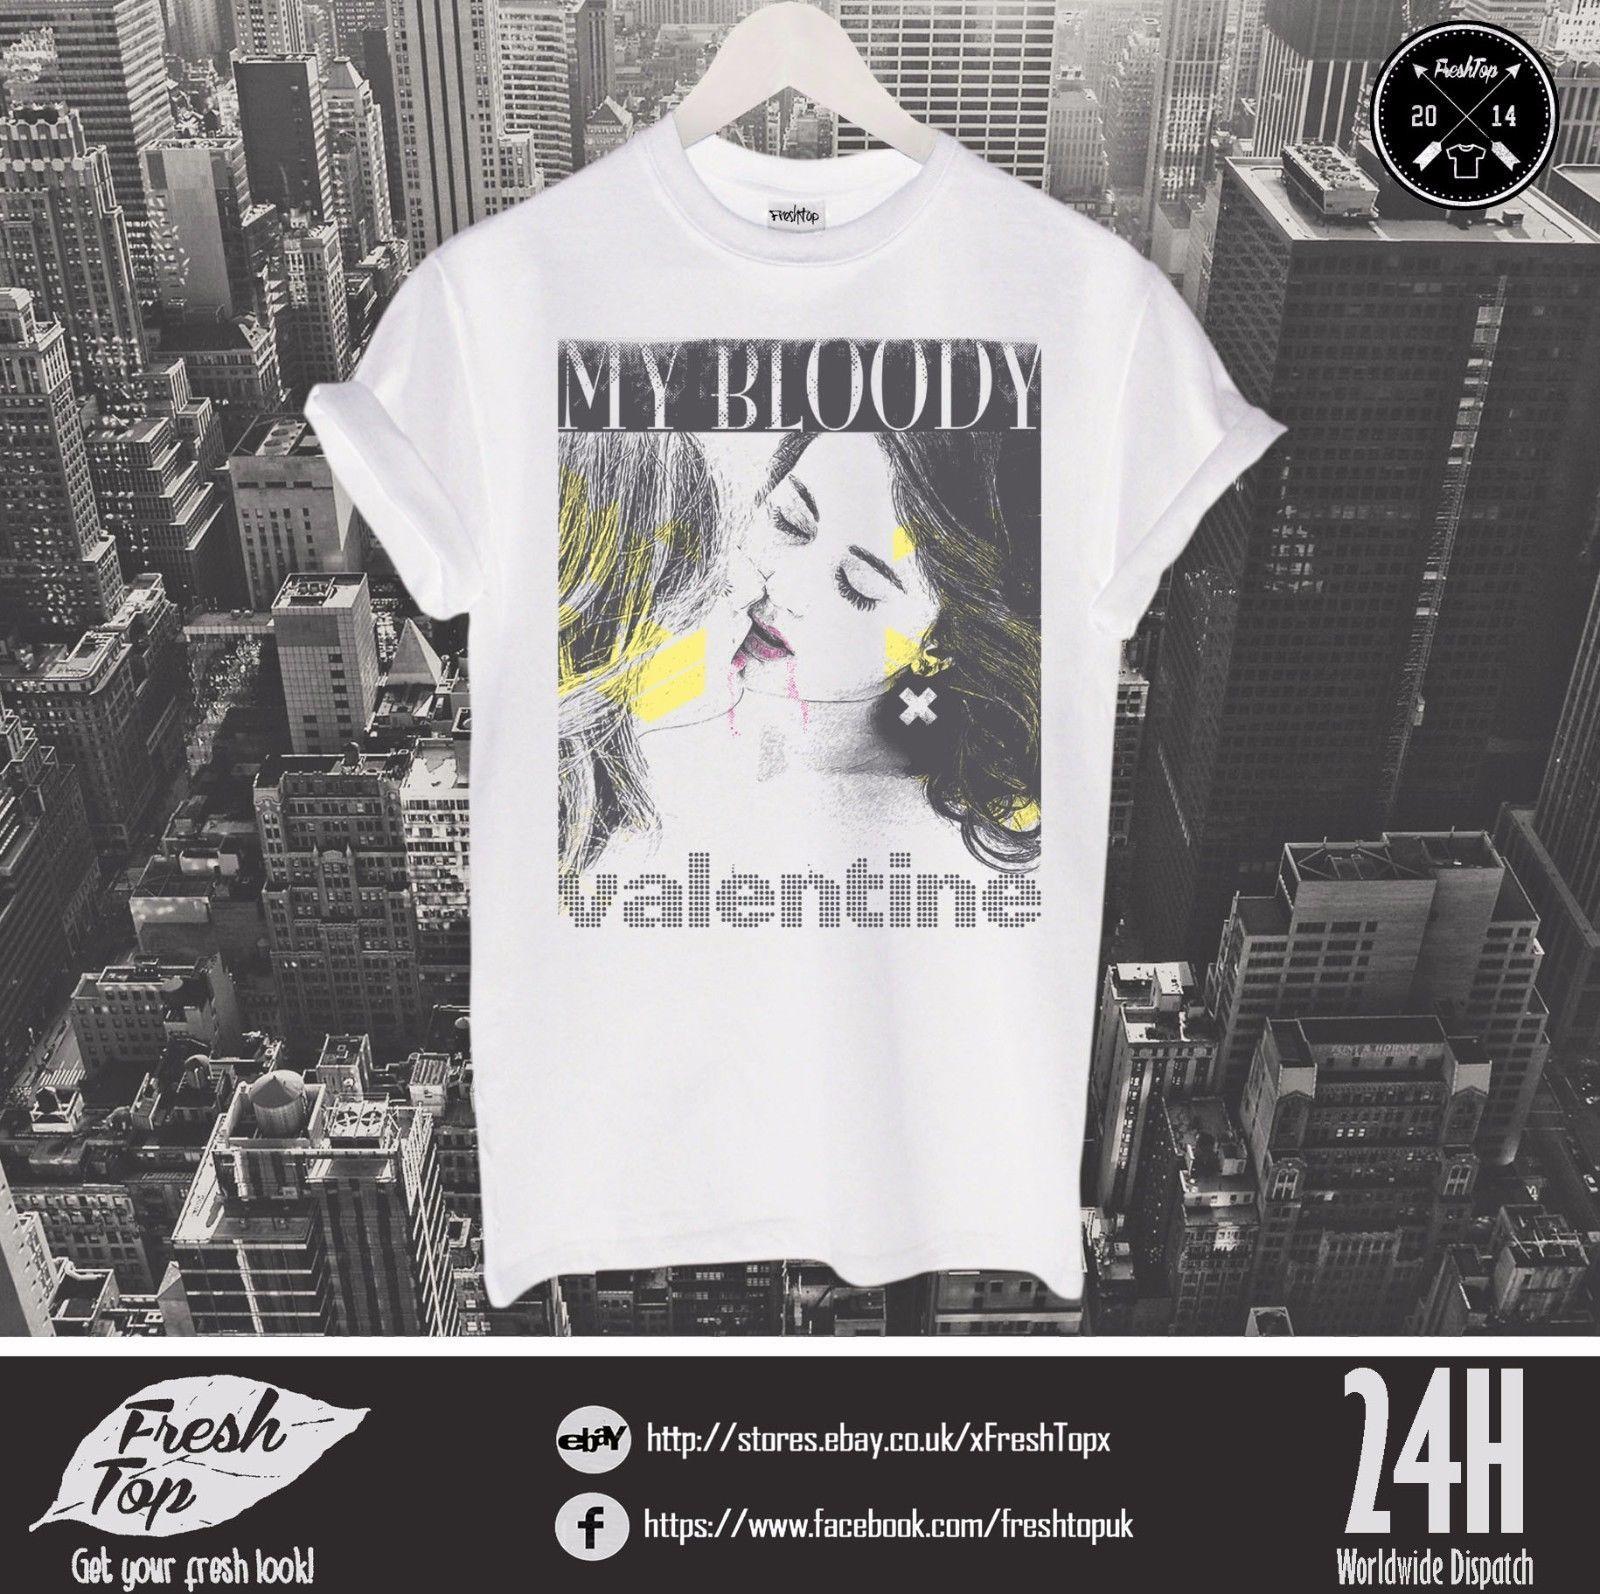 dd33e2280d59e My Bloody Valentine T Shirt Top Rock Band Concert Gift Kevin Shields  Bilinda Tees Custom Jersey t shirt